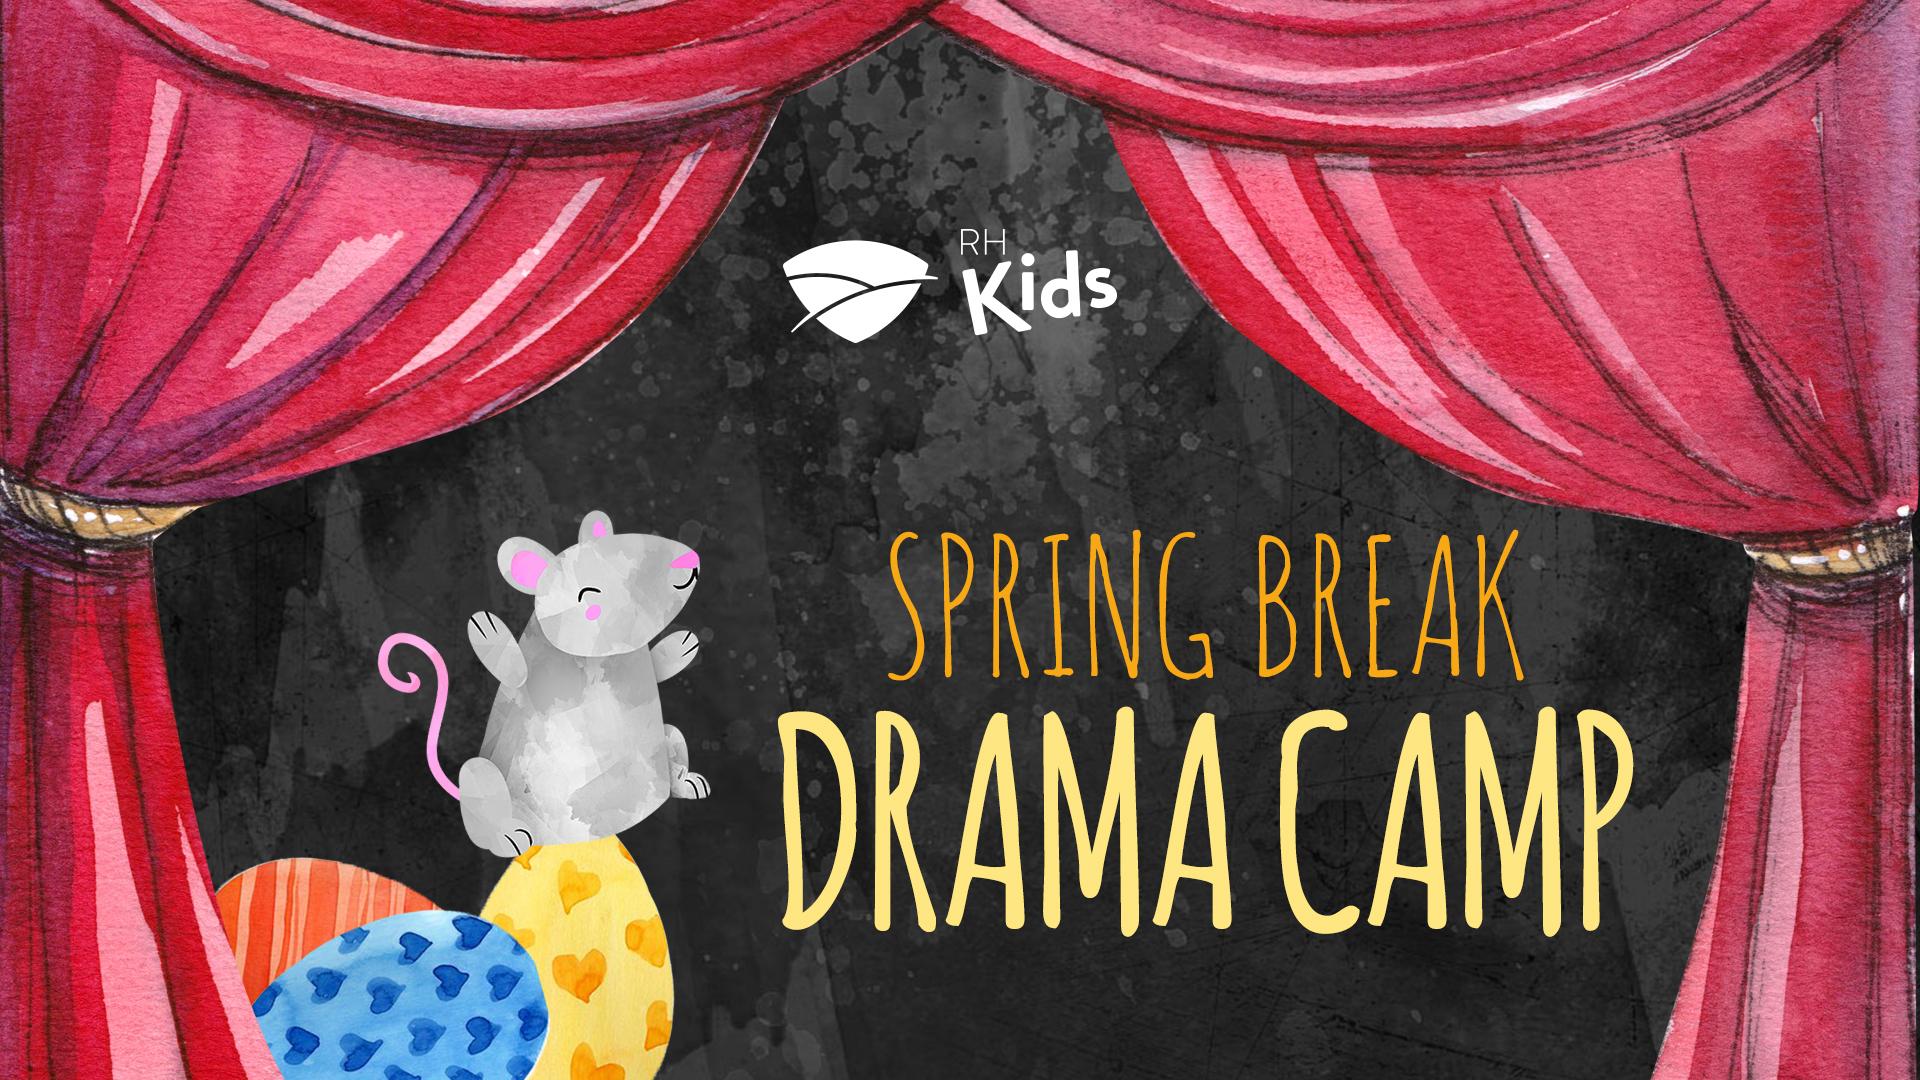 Drama camp 2018 title